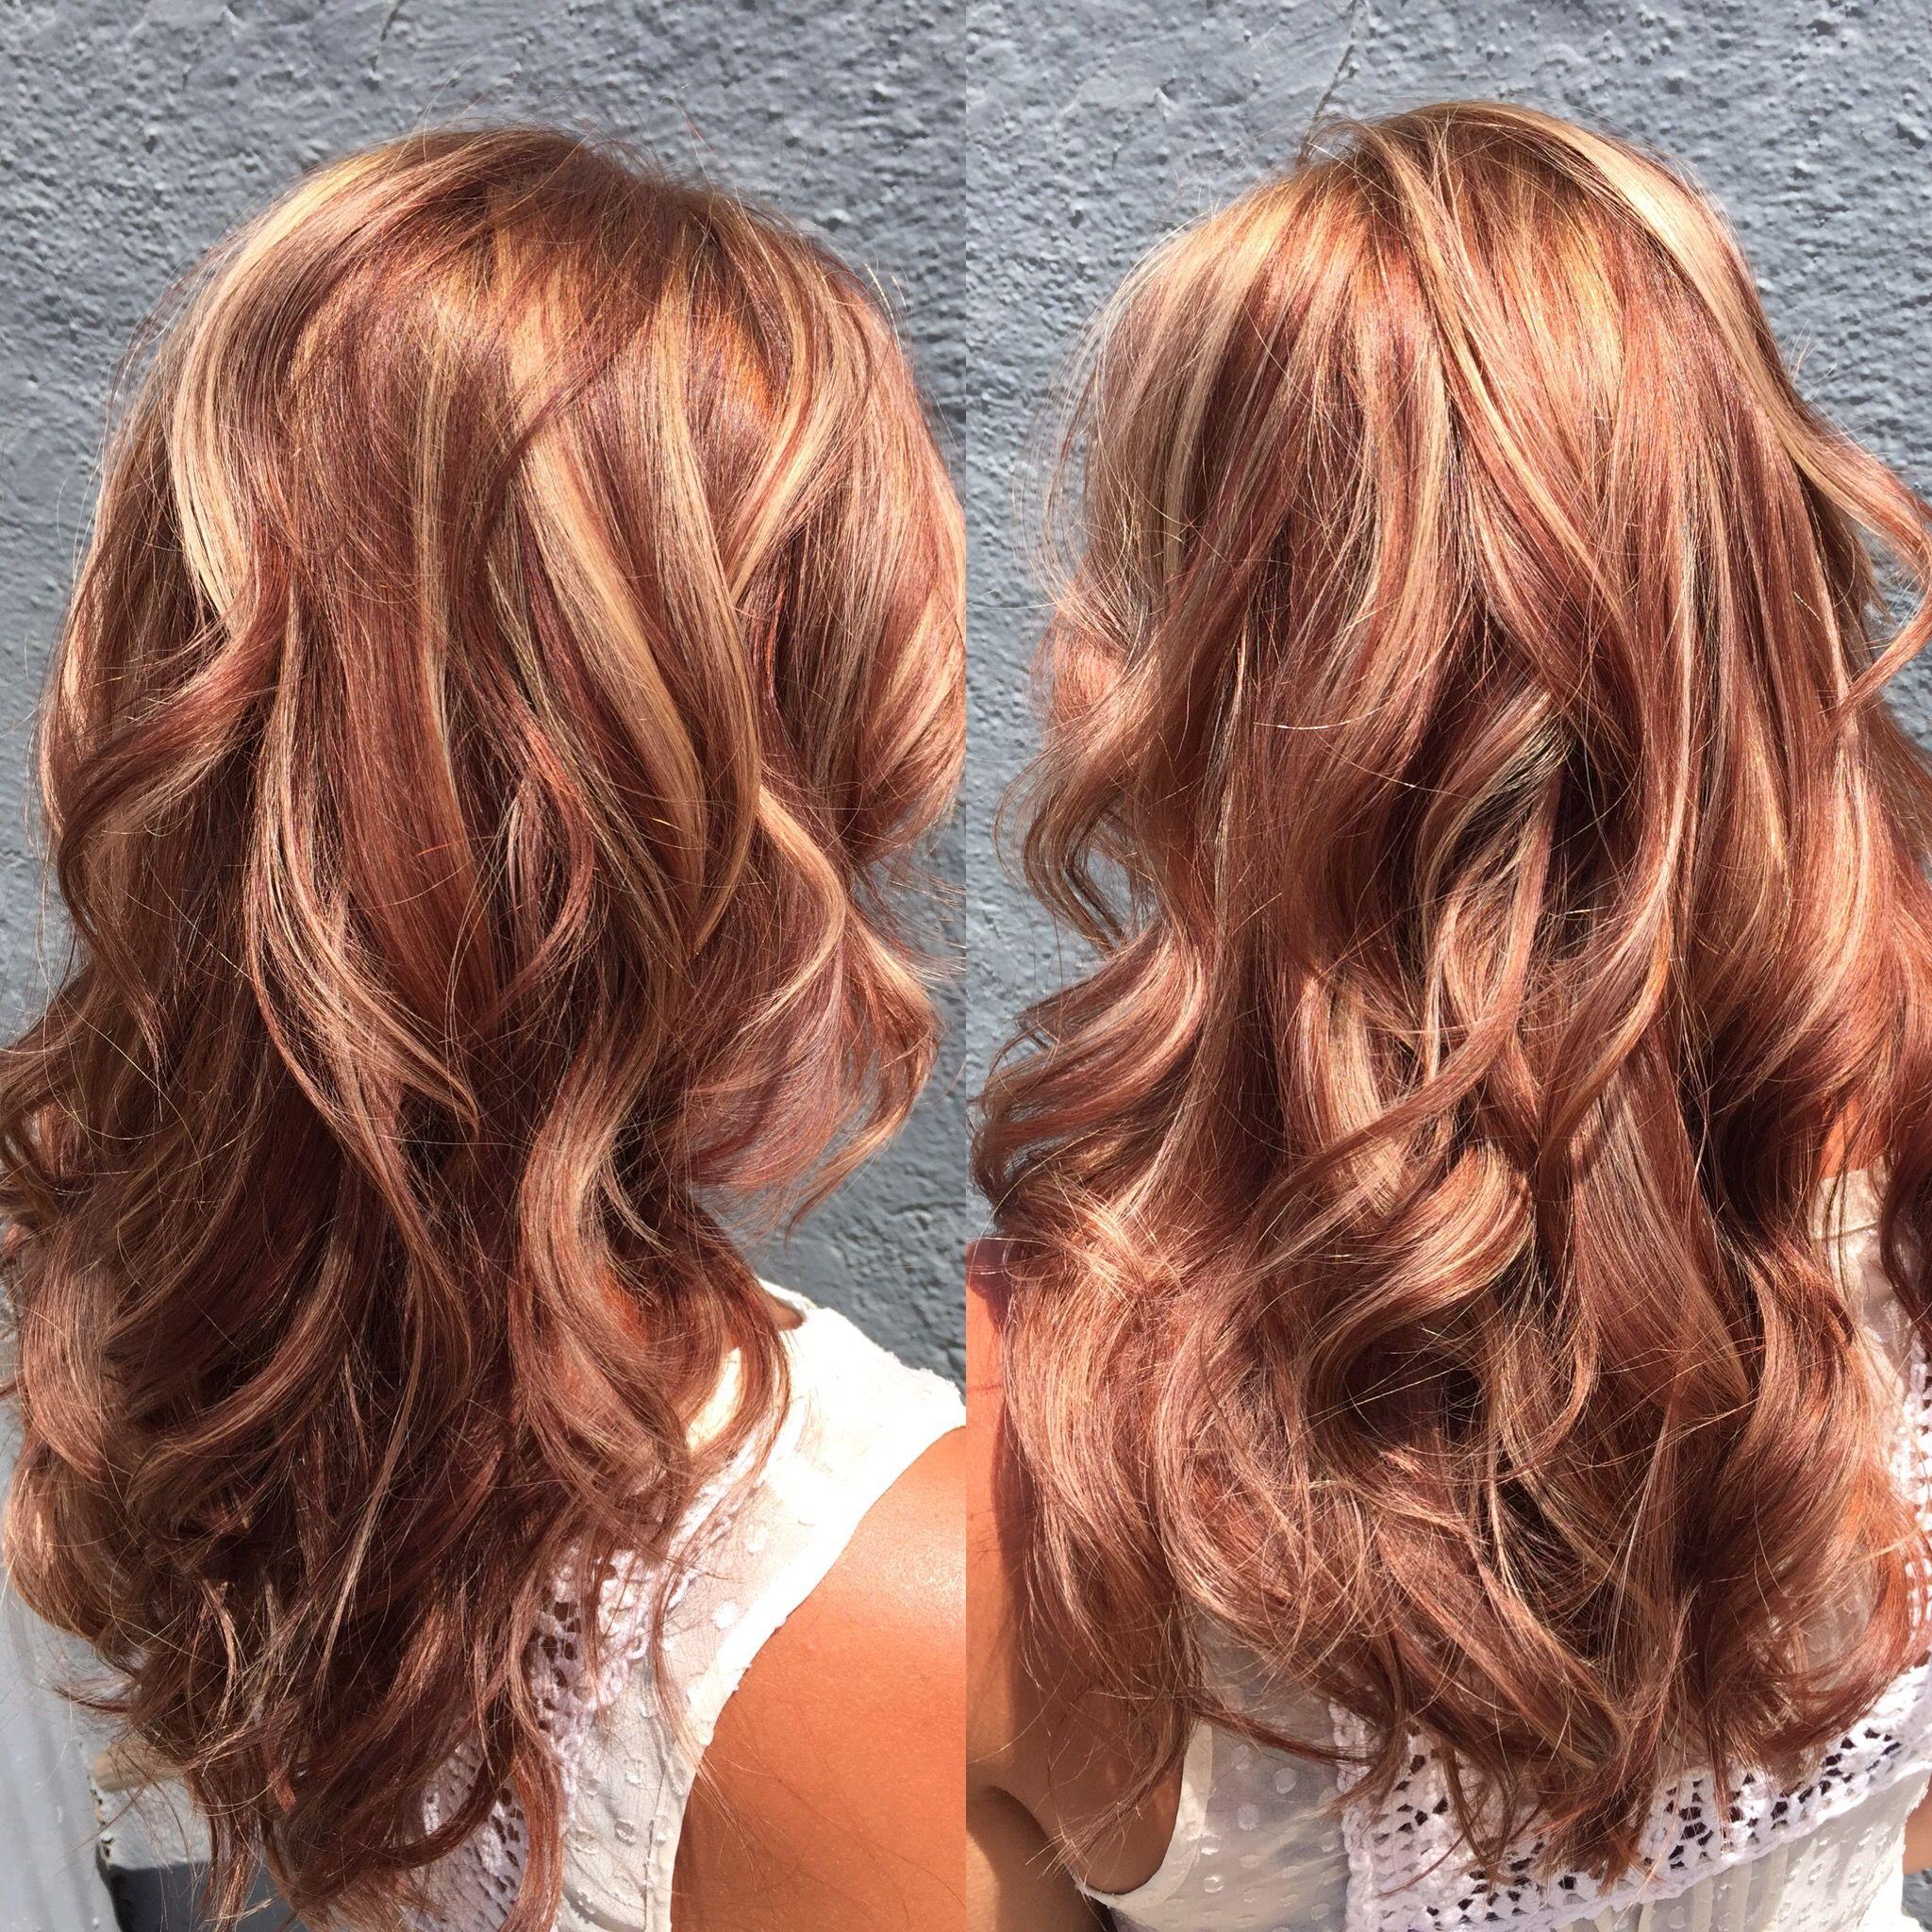 hair hilite-lowlite-auburn-red-blonde-waves-long